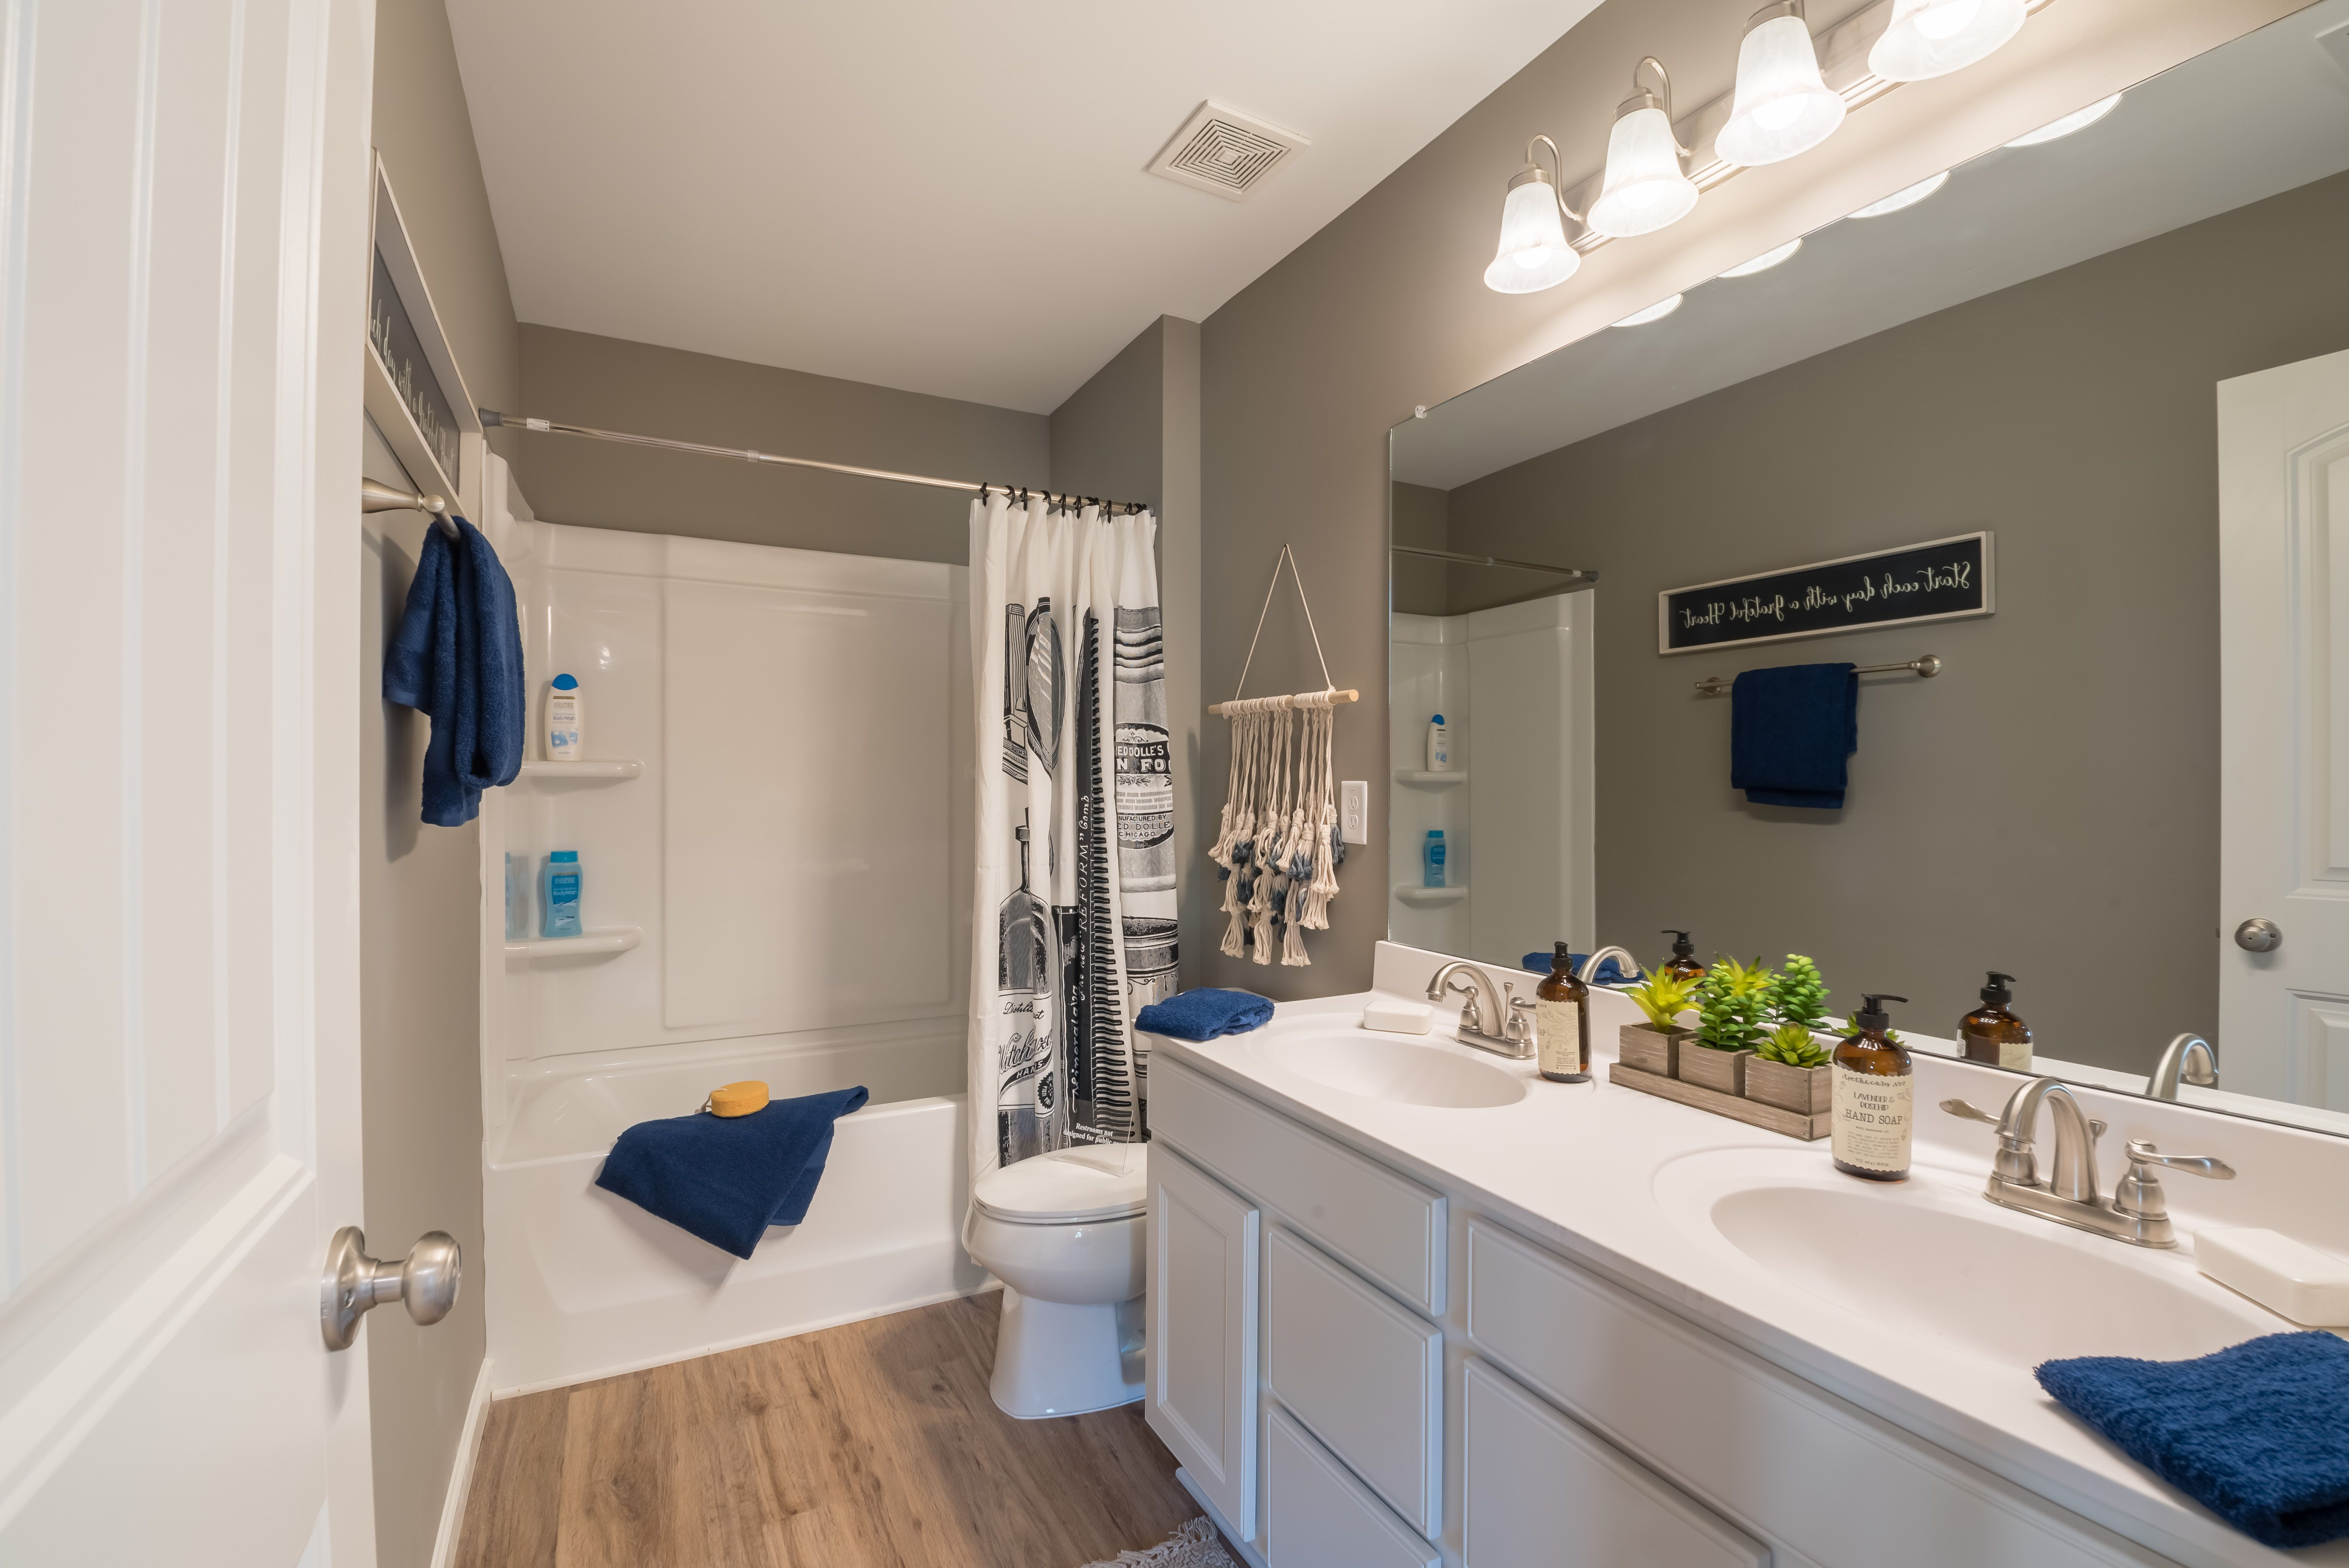 Bathroom featured in the Cumberland By Fischer Homes  in Cincinnati, OH